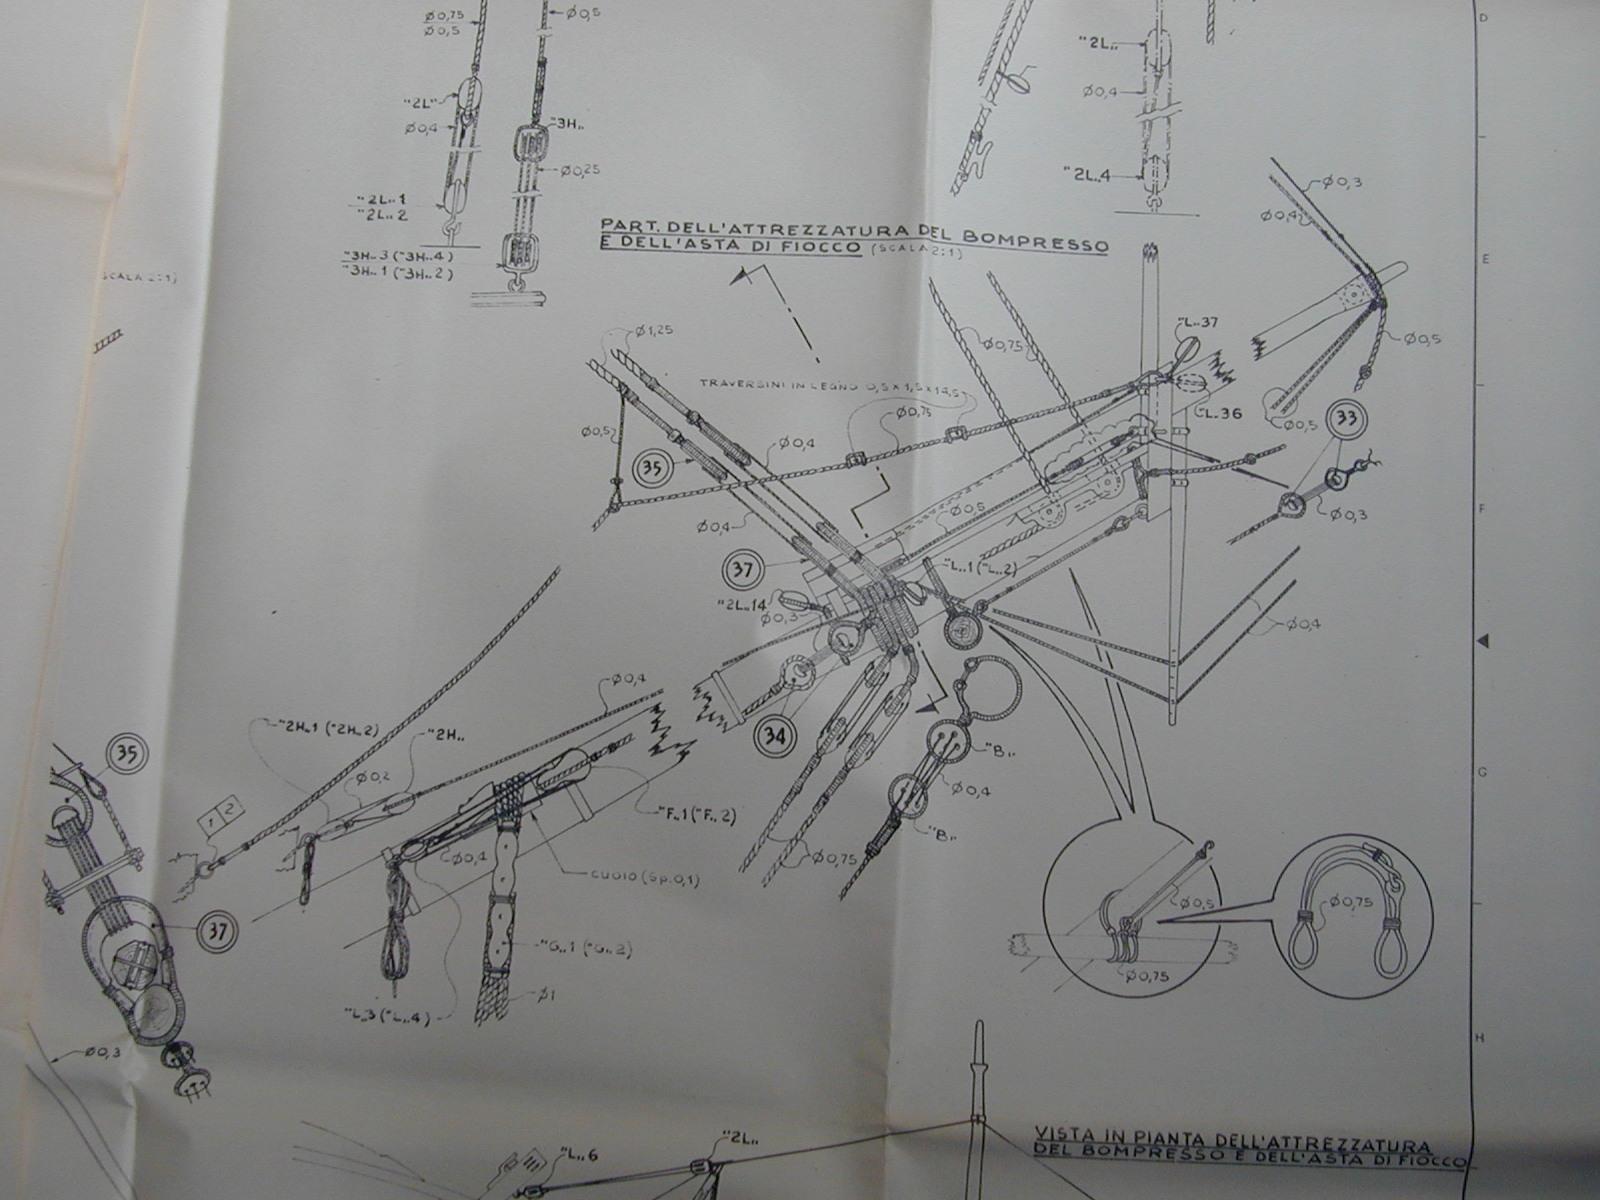 drawing schema schematic schematics schematical plan blueprint construction black lines